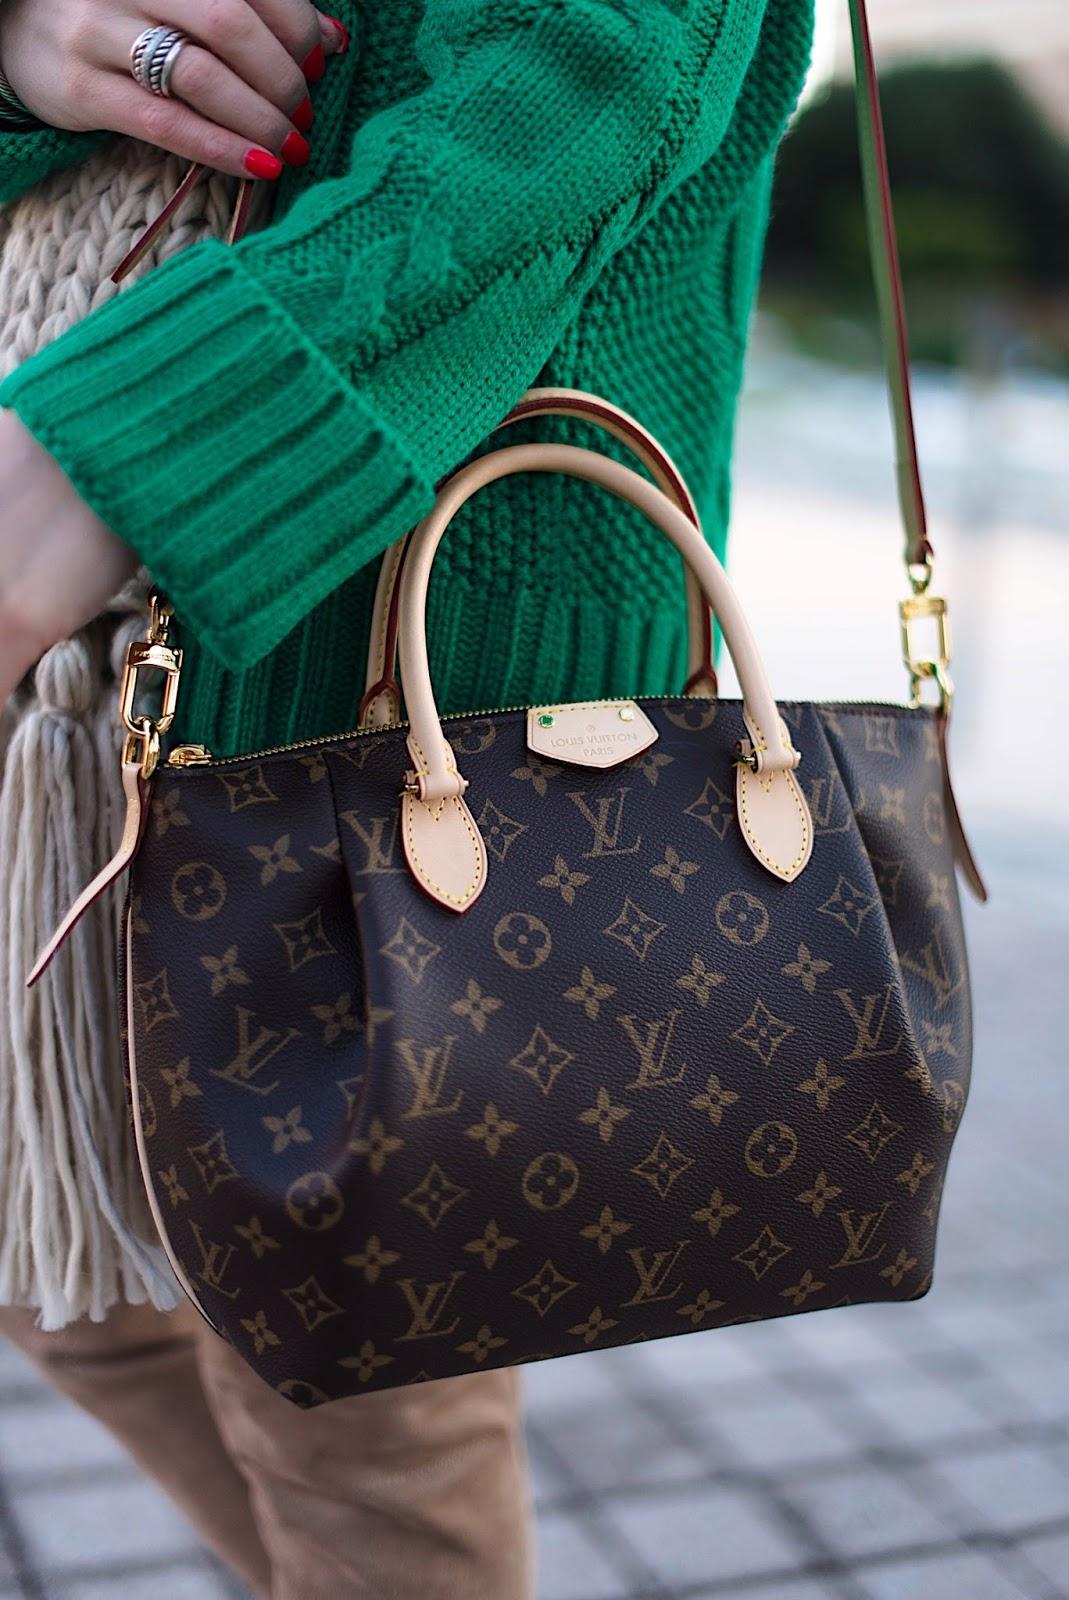 Louis Vuitton Turenne PM - Something Delightful Blog